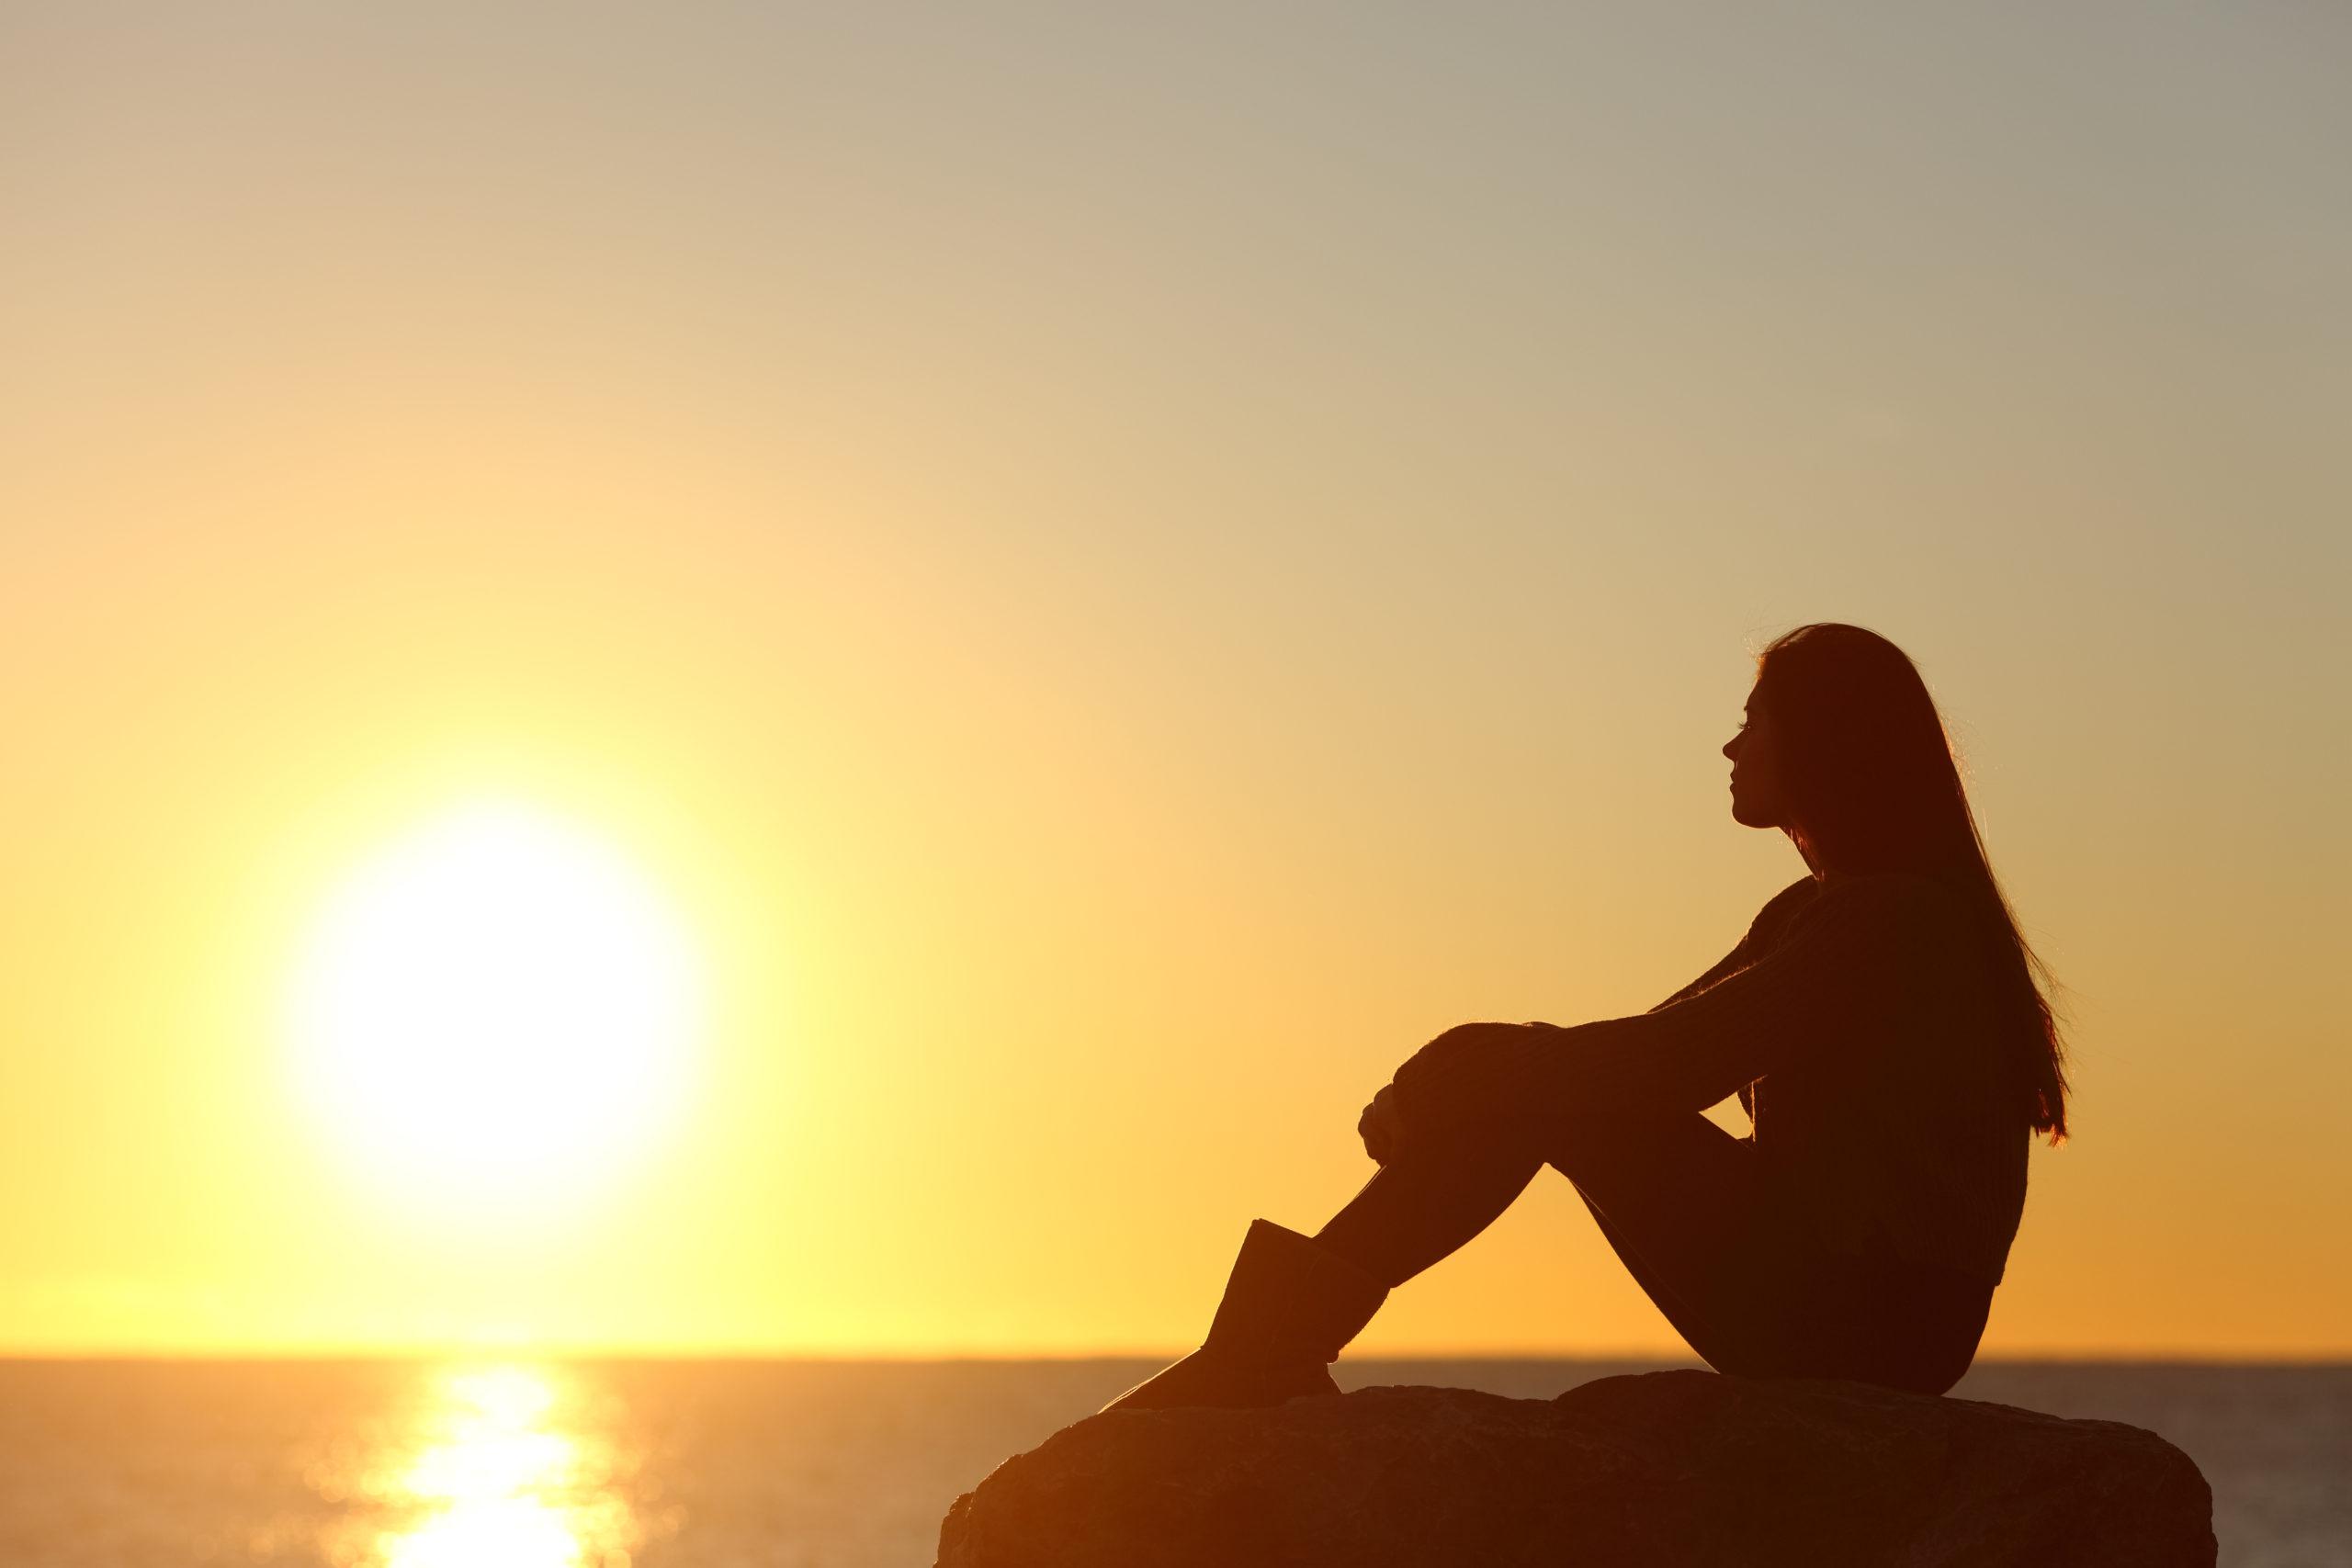 profile-woman-silhouette-watching-sun-on-249461866